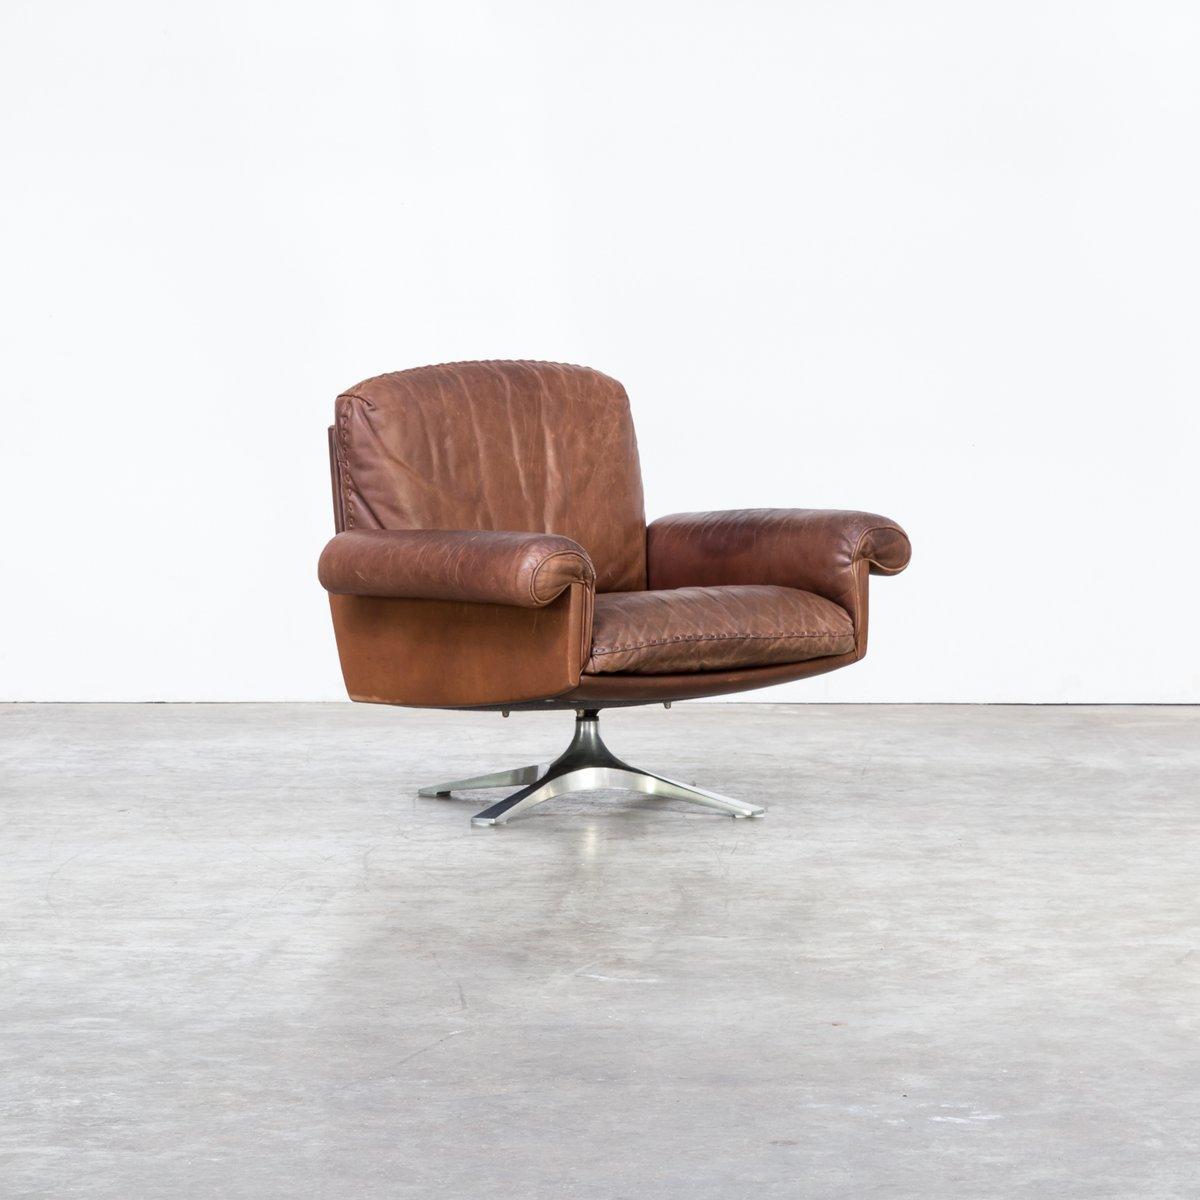 ds31 sessel von de sede 1960er bei pamono kaufen. Black Bedroom Furniture Sets. Home Design Ideas